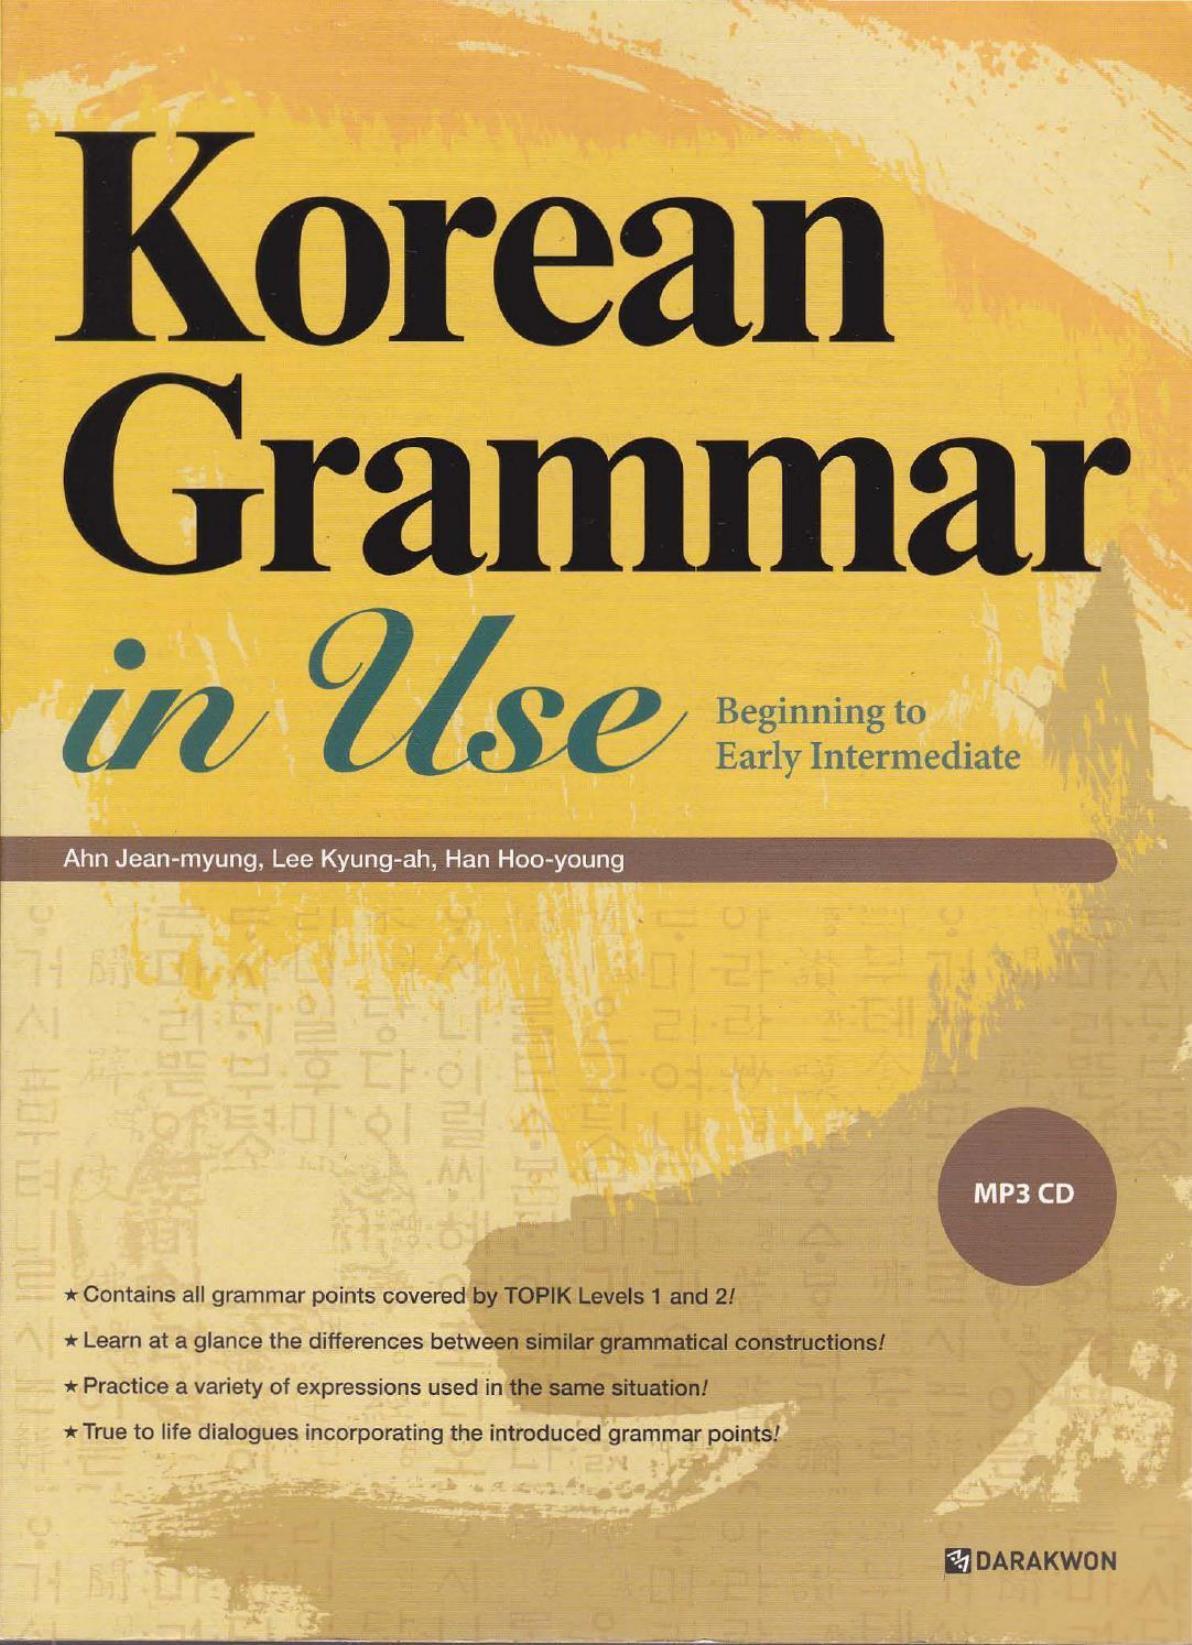 Korean Grammar In Use Intermediate Pdf